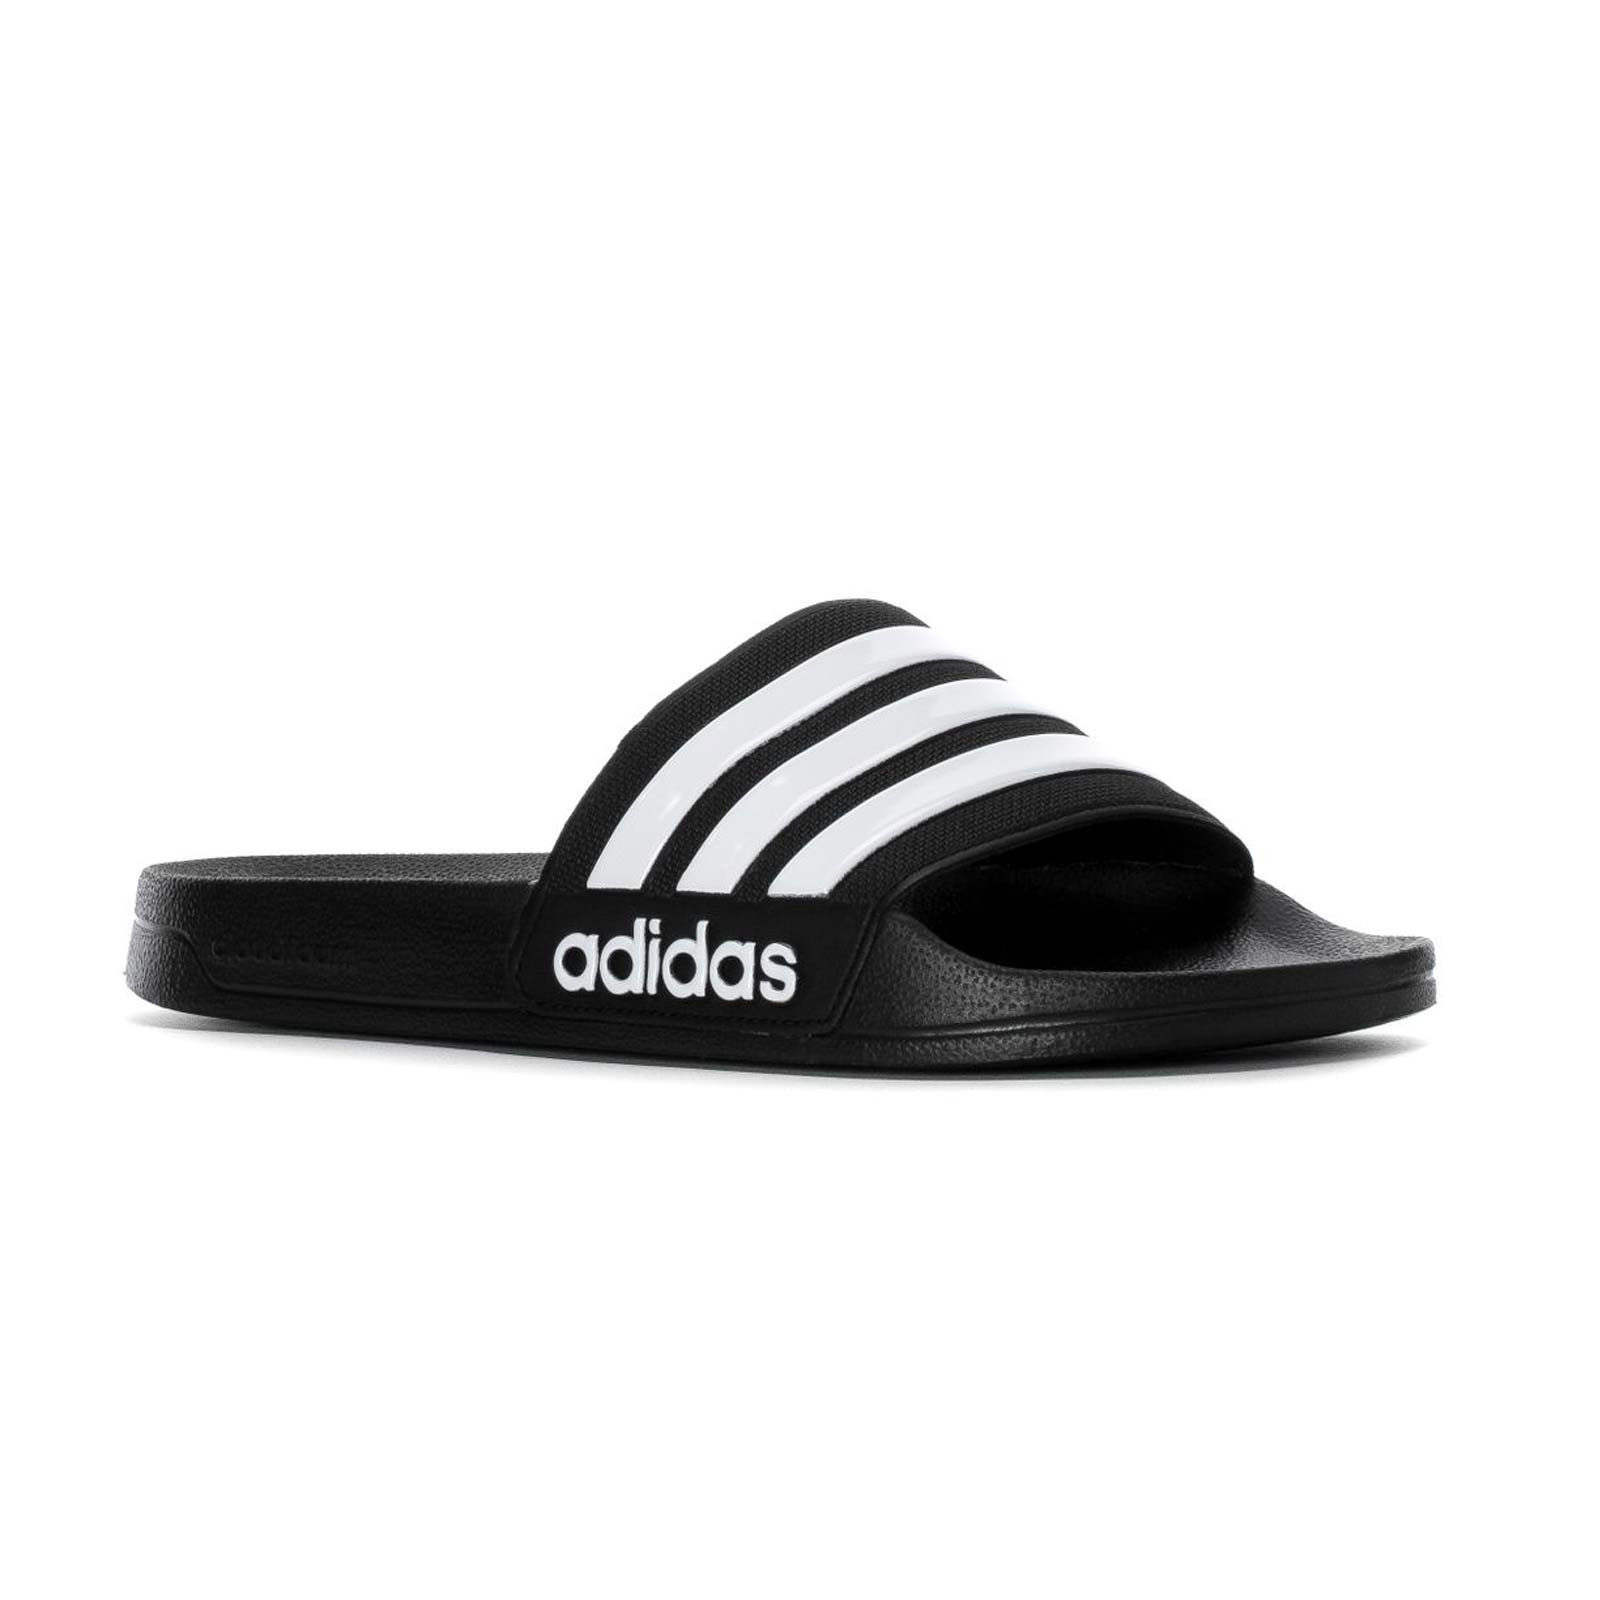 Decano atmósfera Distribuir  Sandalias Adidas Adilette Shower Sportswear para Hombre | Runa Store